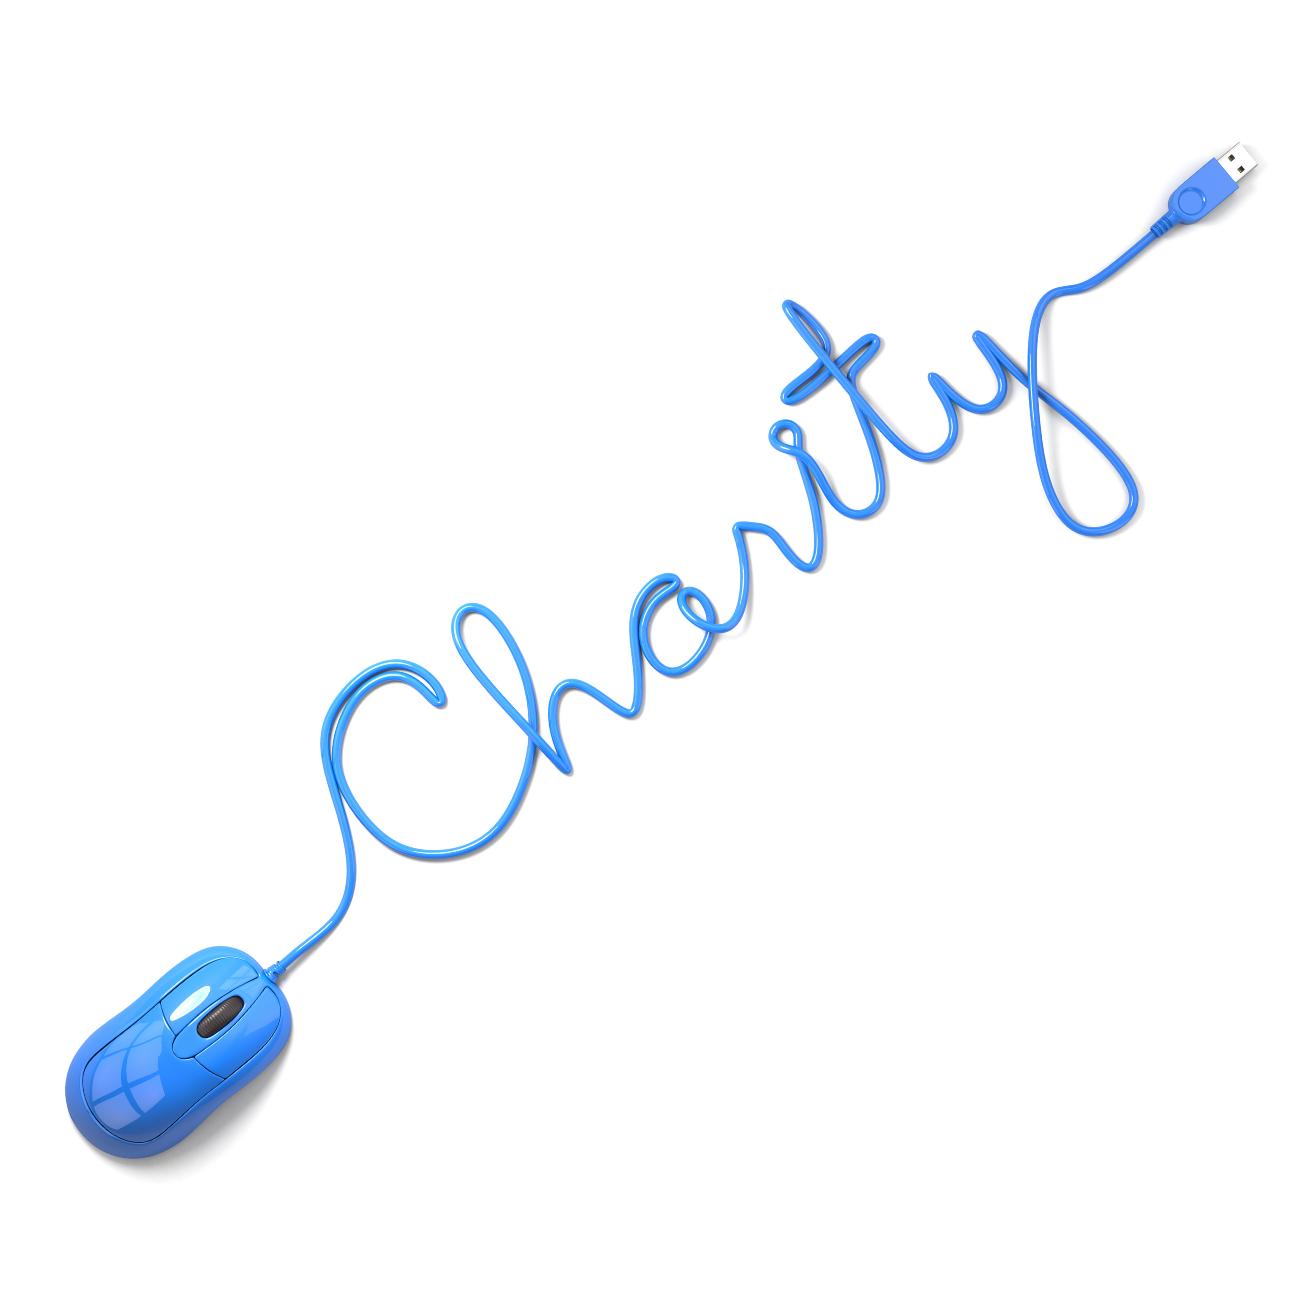 sq - charity